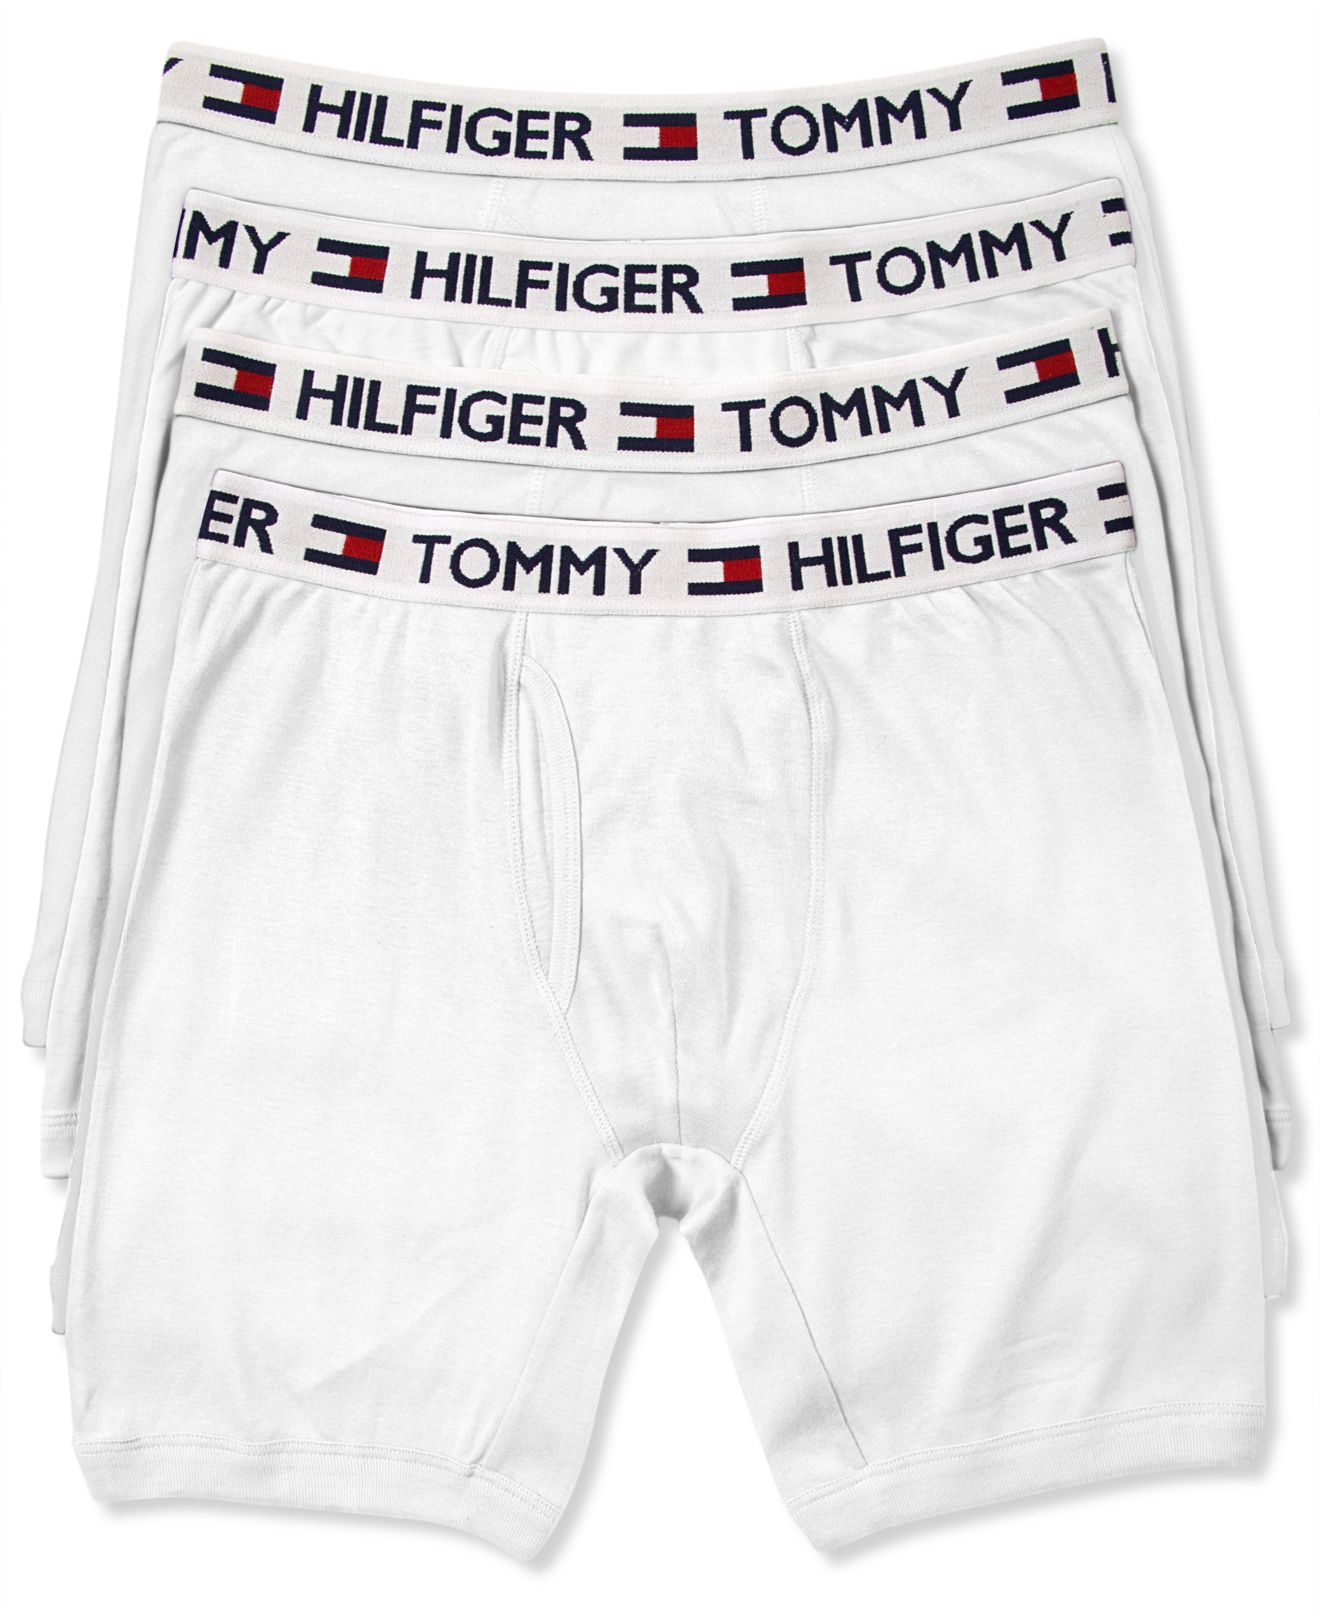 tommy hilfiger cotton boxer brief 4 pack in white for men lyst. Black Bedroom Furniture Sets. Home Design Ideas